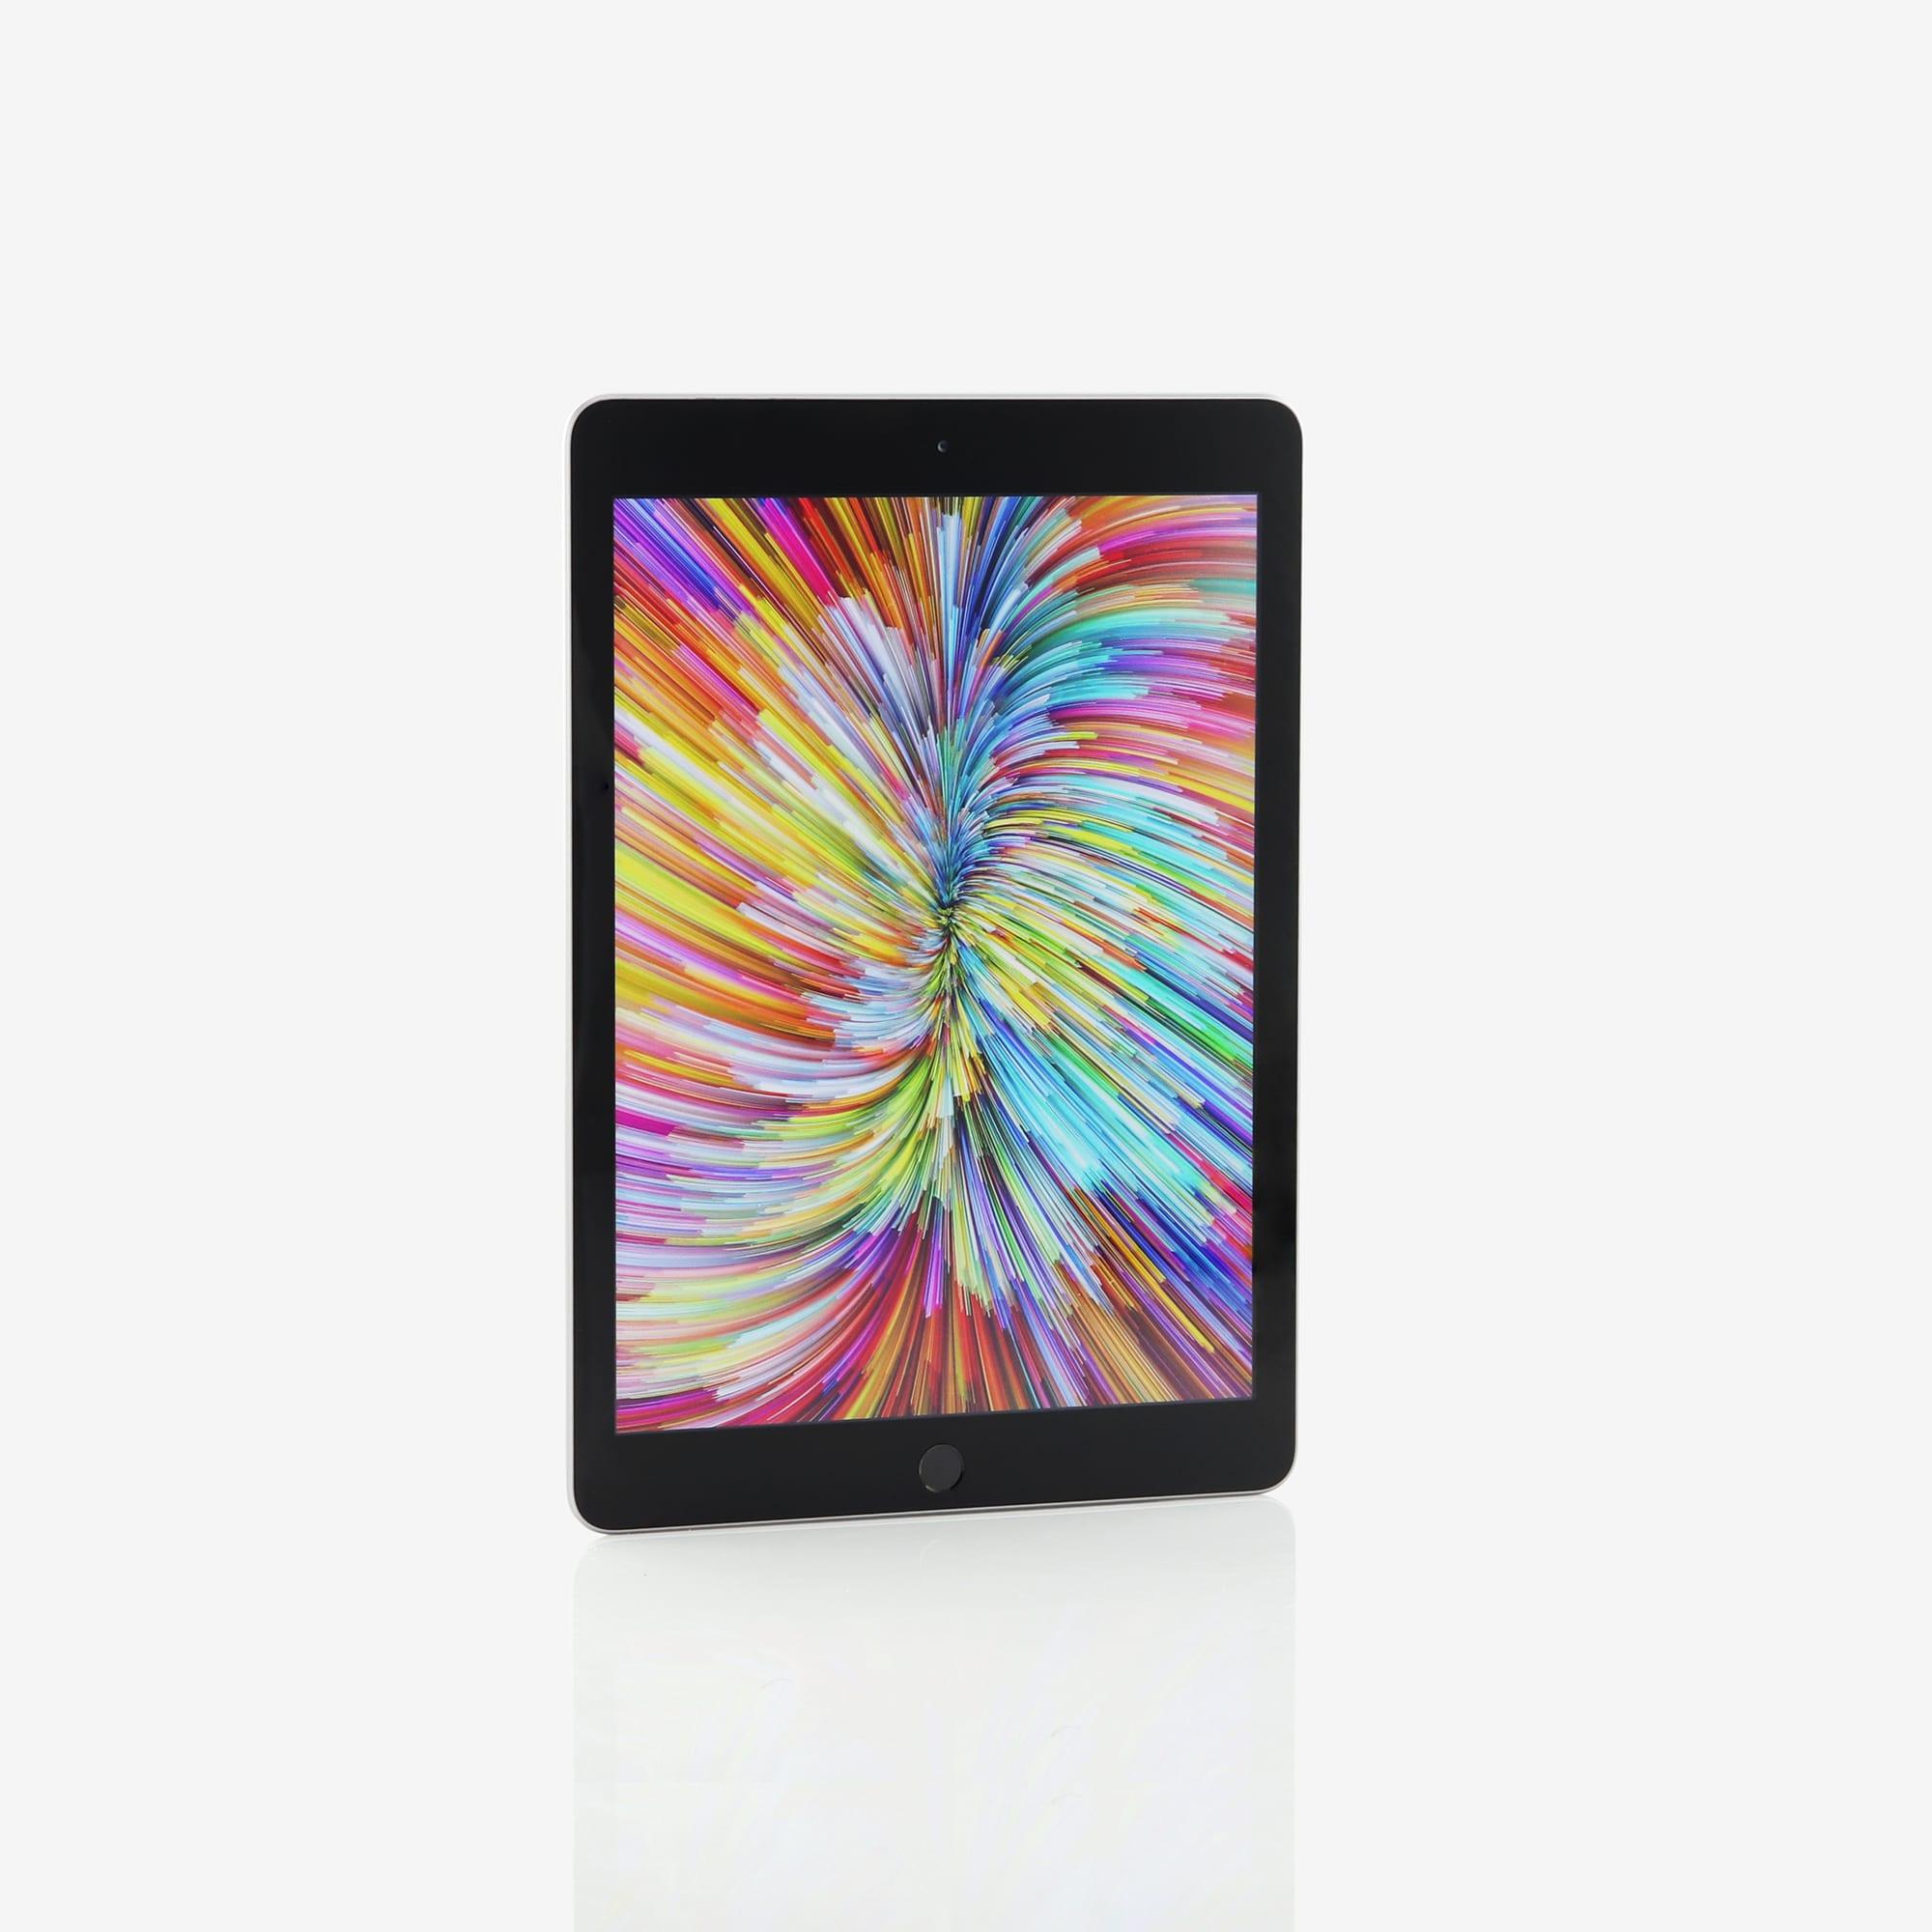 1 x iPad (5th generation) (Wi-Fi) Space Grey